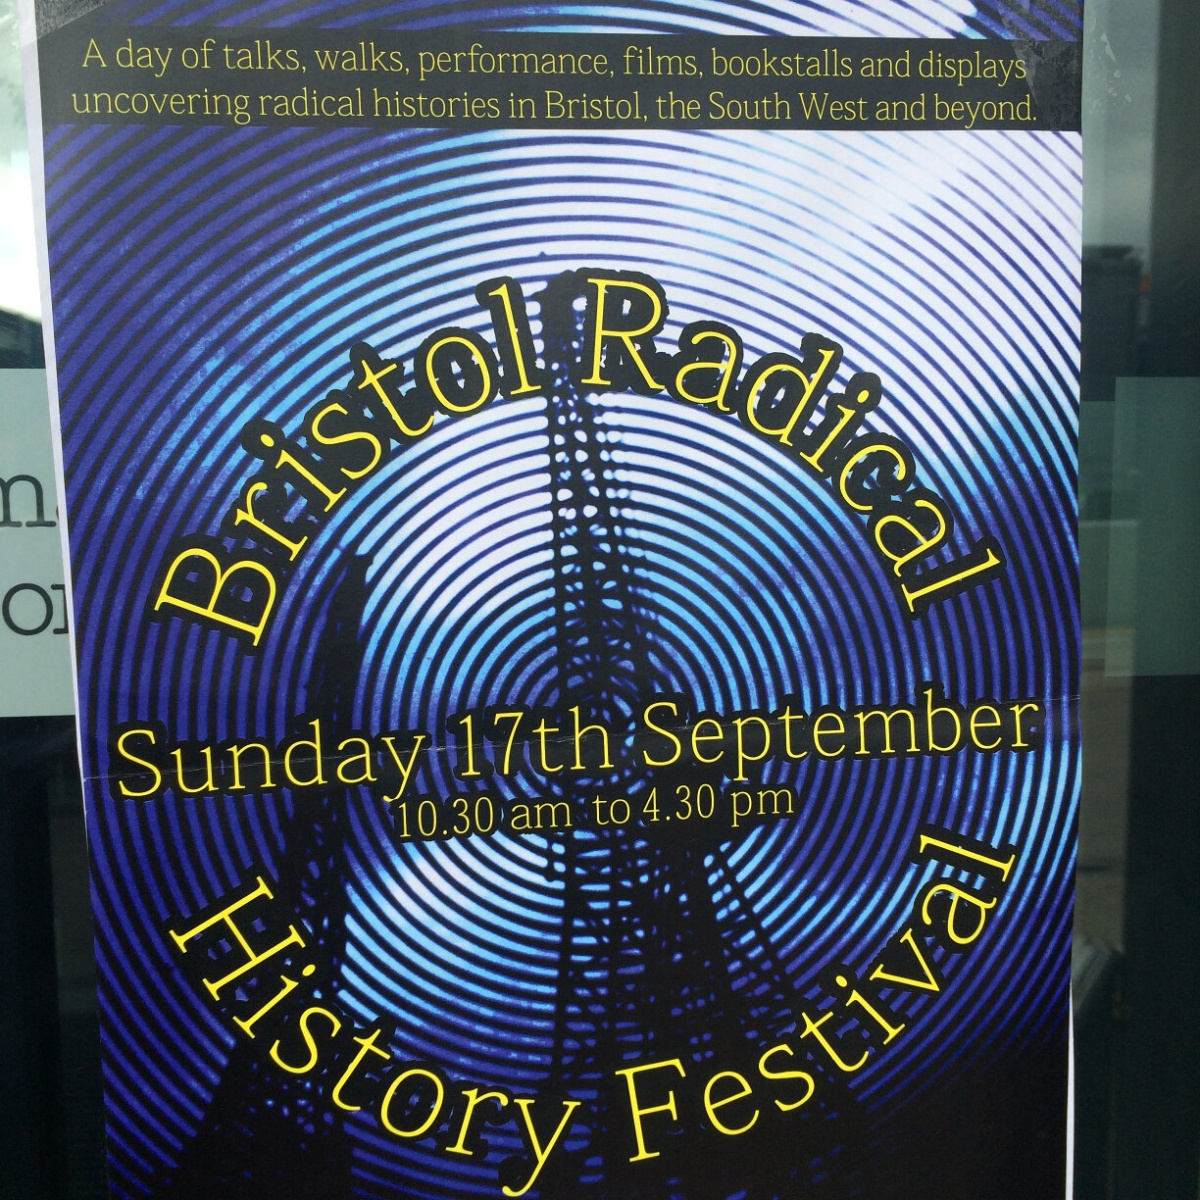 Bristol: Clichéd Football; Radical History